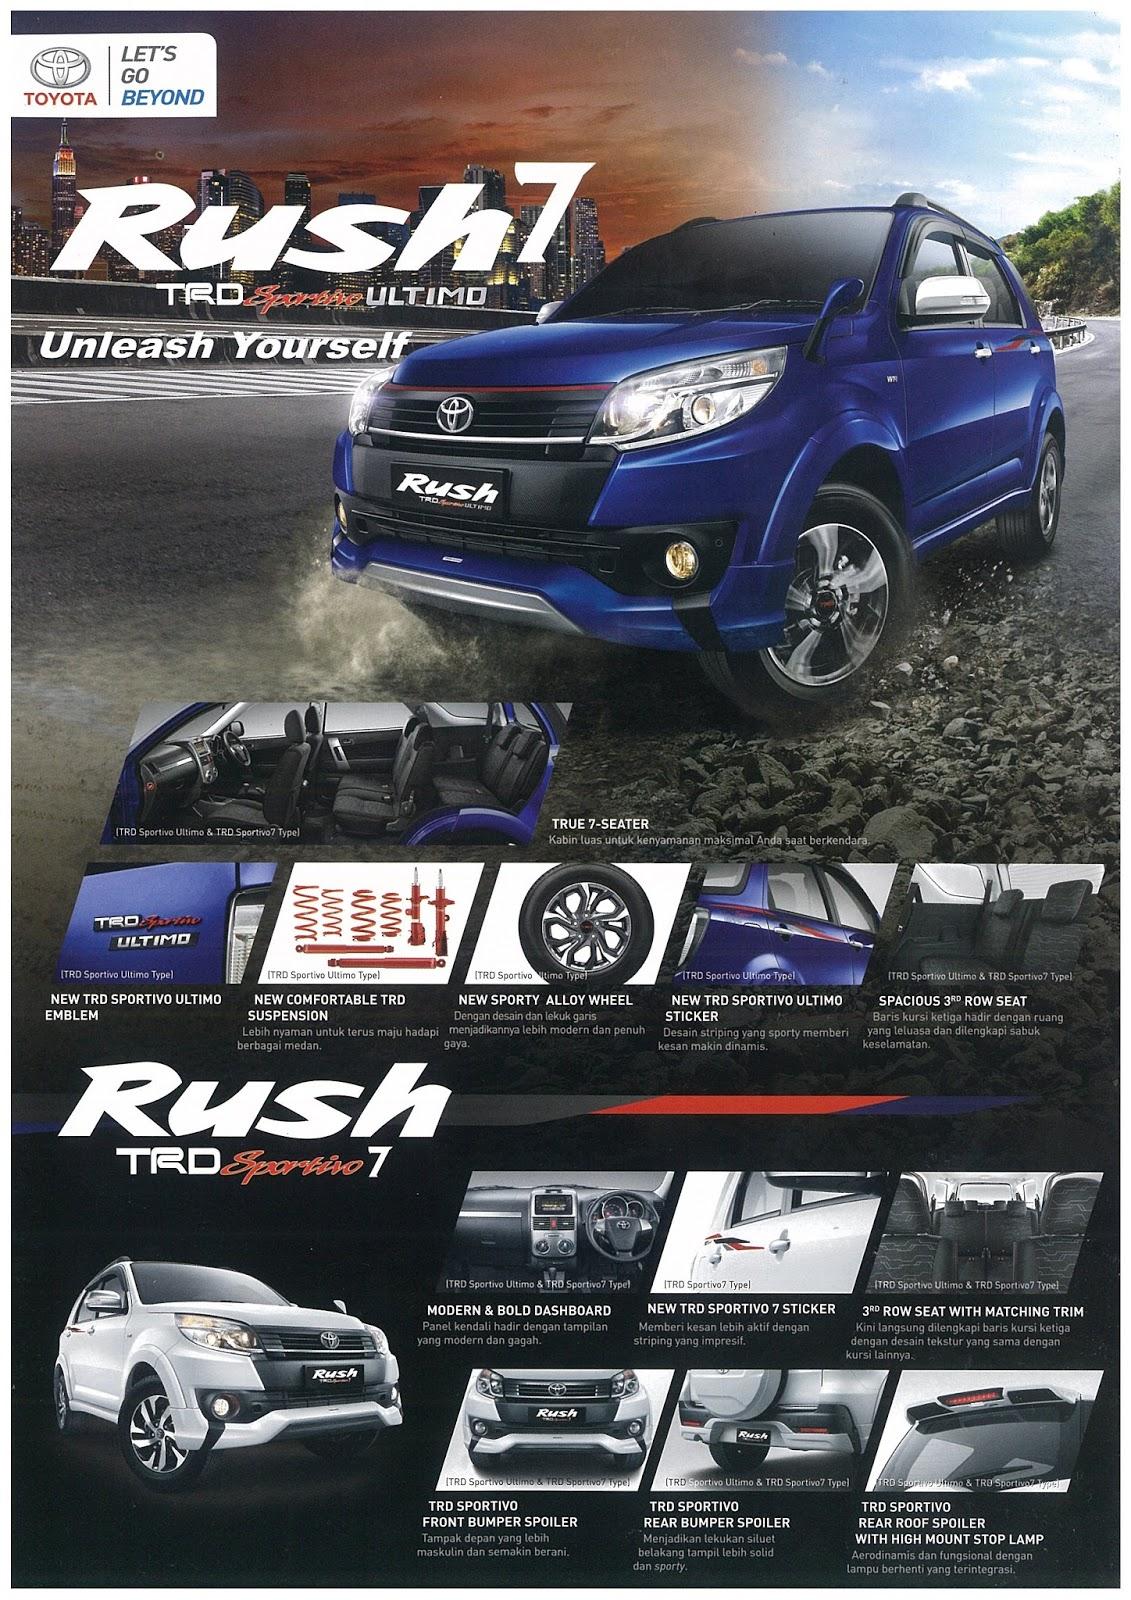 Toyota Yaris Trd Sportivo Bekas Bandung Harga All New Kijang Innova Q Rush Ultimo Dealer Astra